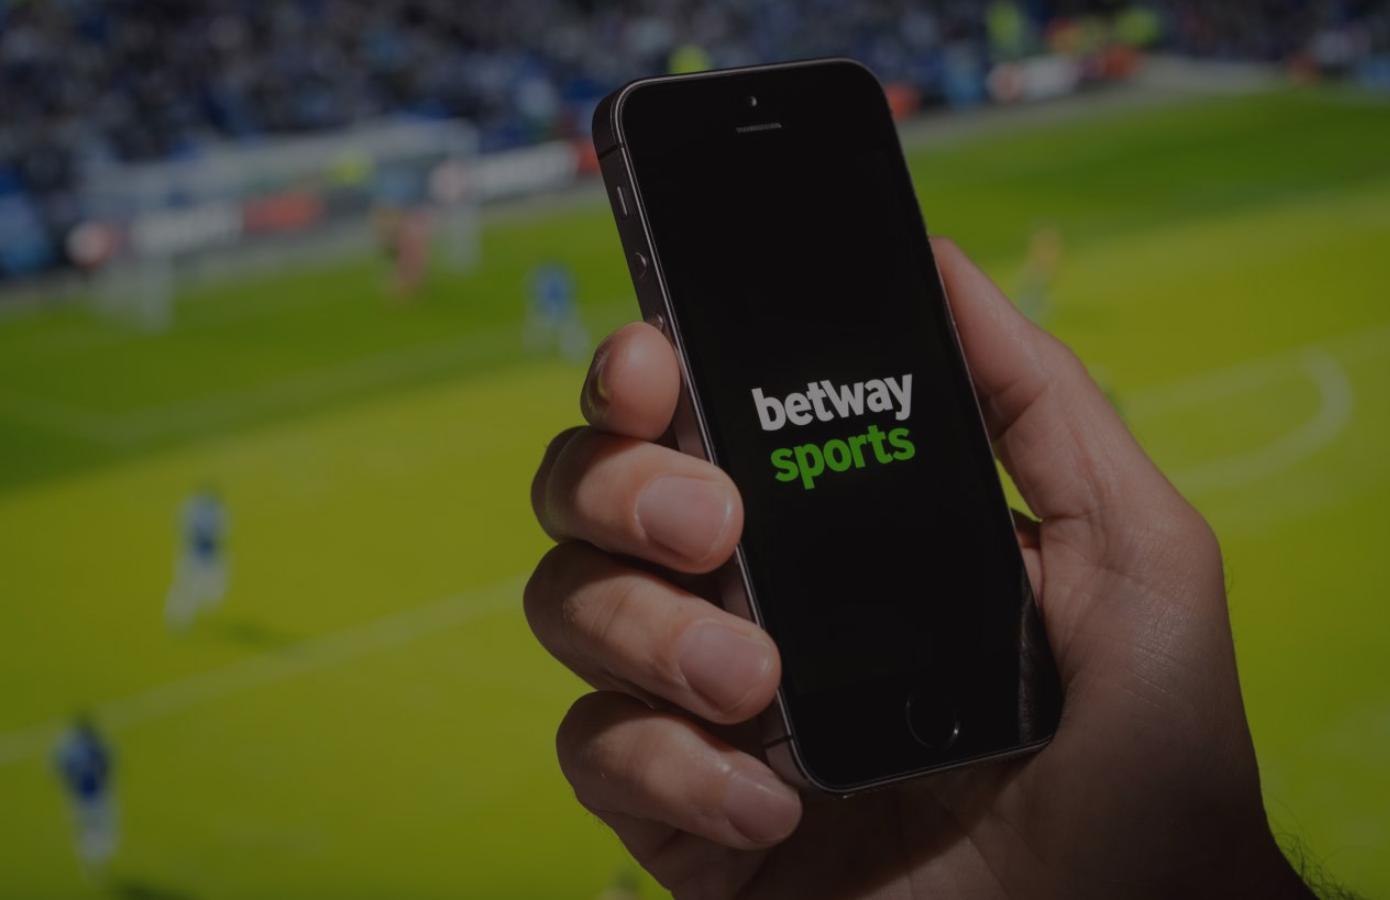 Versão móvel Betway mobile Android app